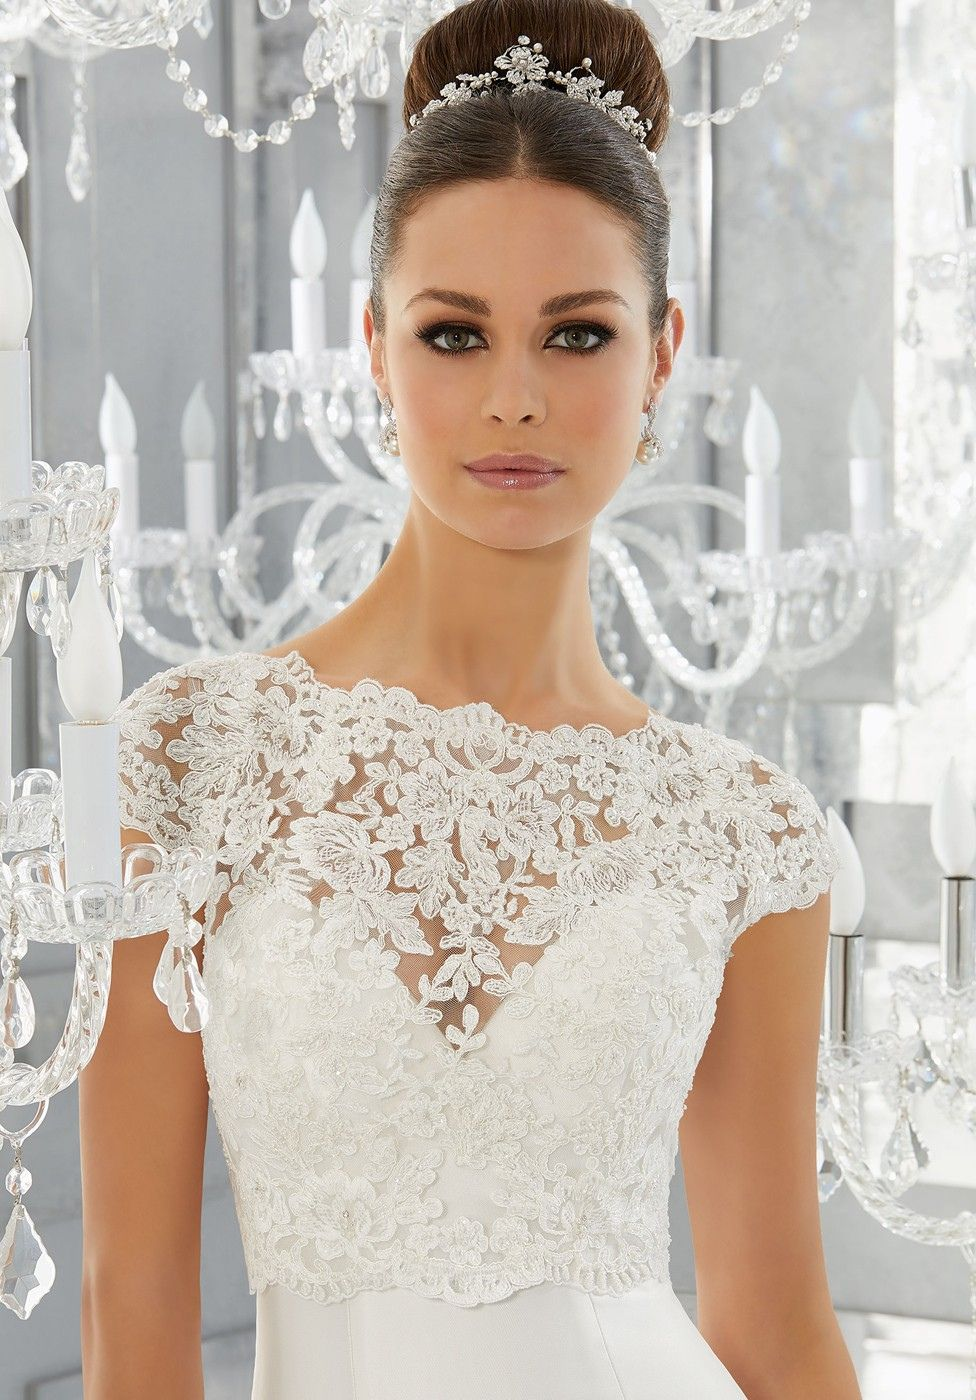 2018 Wedding Dress Jacket - Women\'s Dresses for Weddings Check more ...